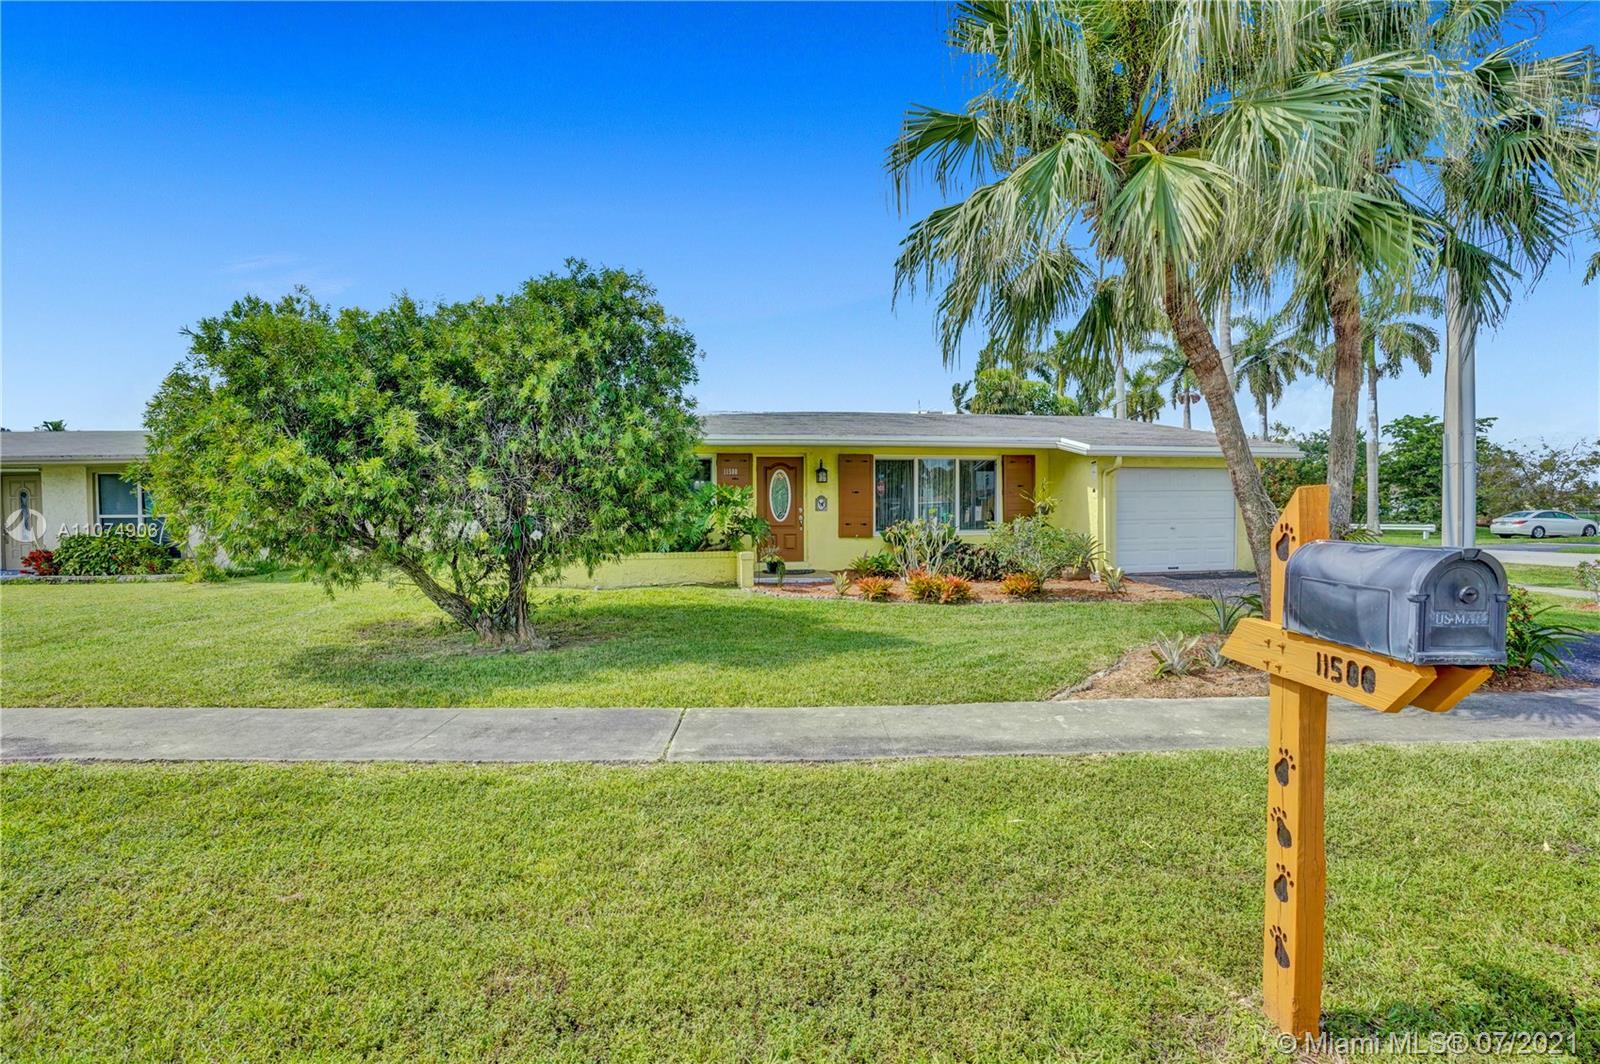 Sunrise Golf Village - 11500 NW 39th St, Sunrise, FL 33323